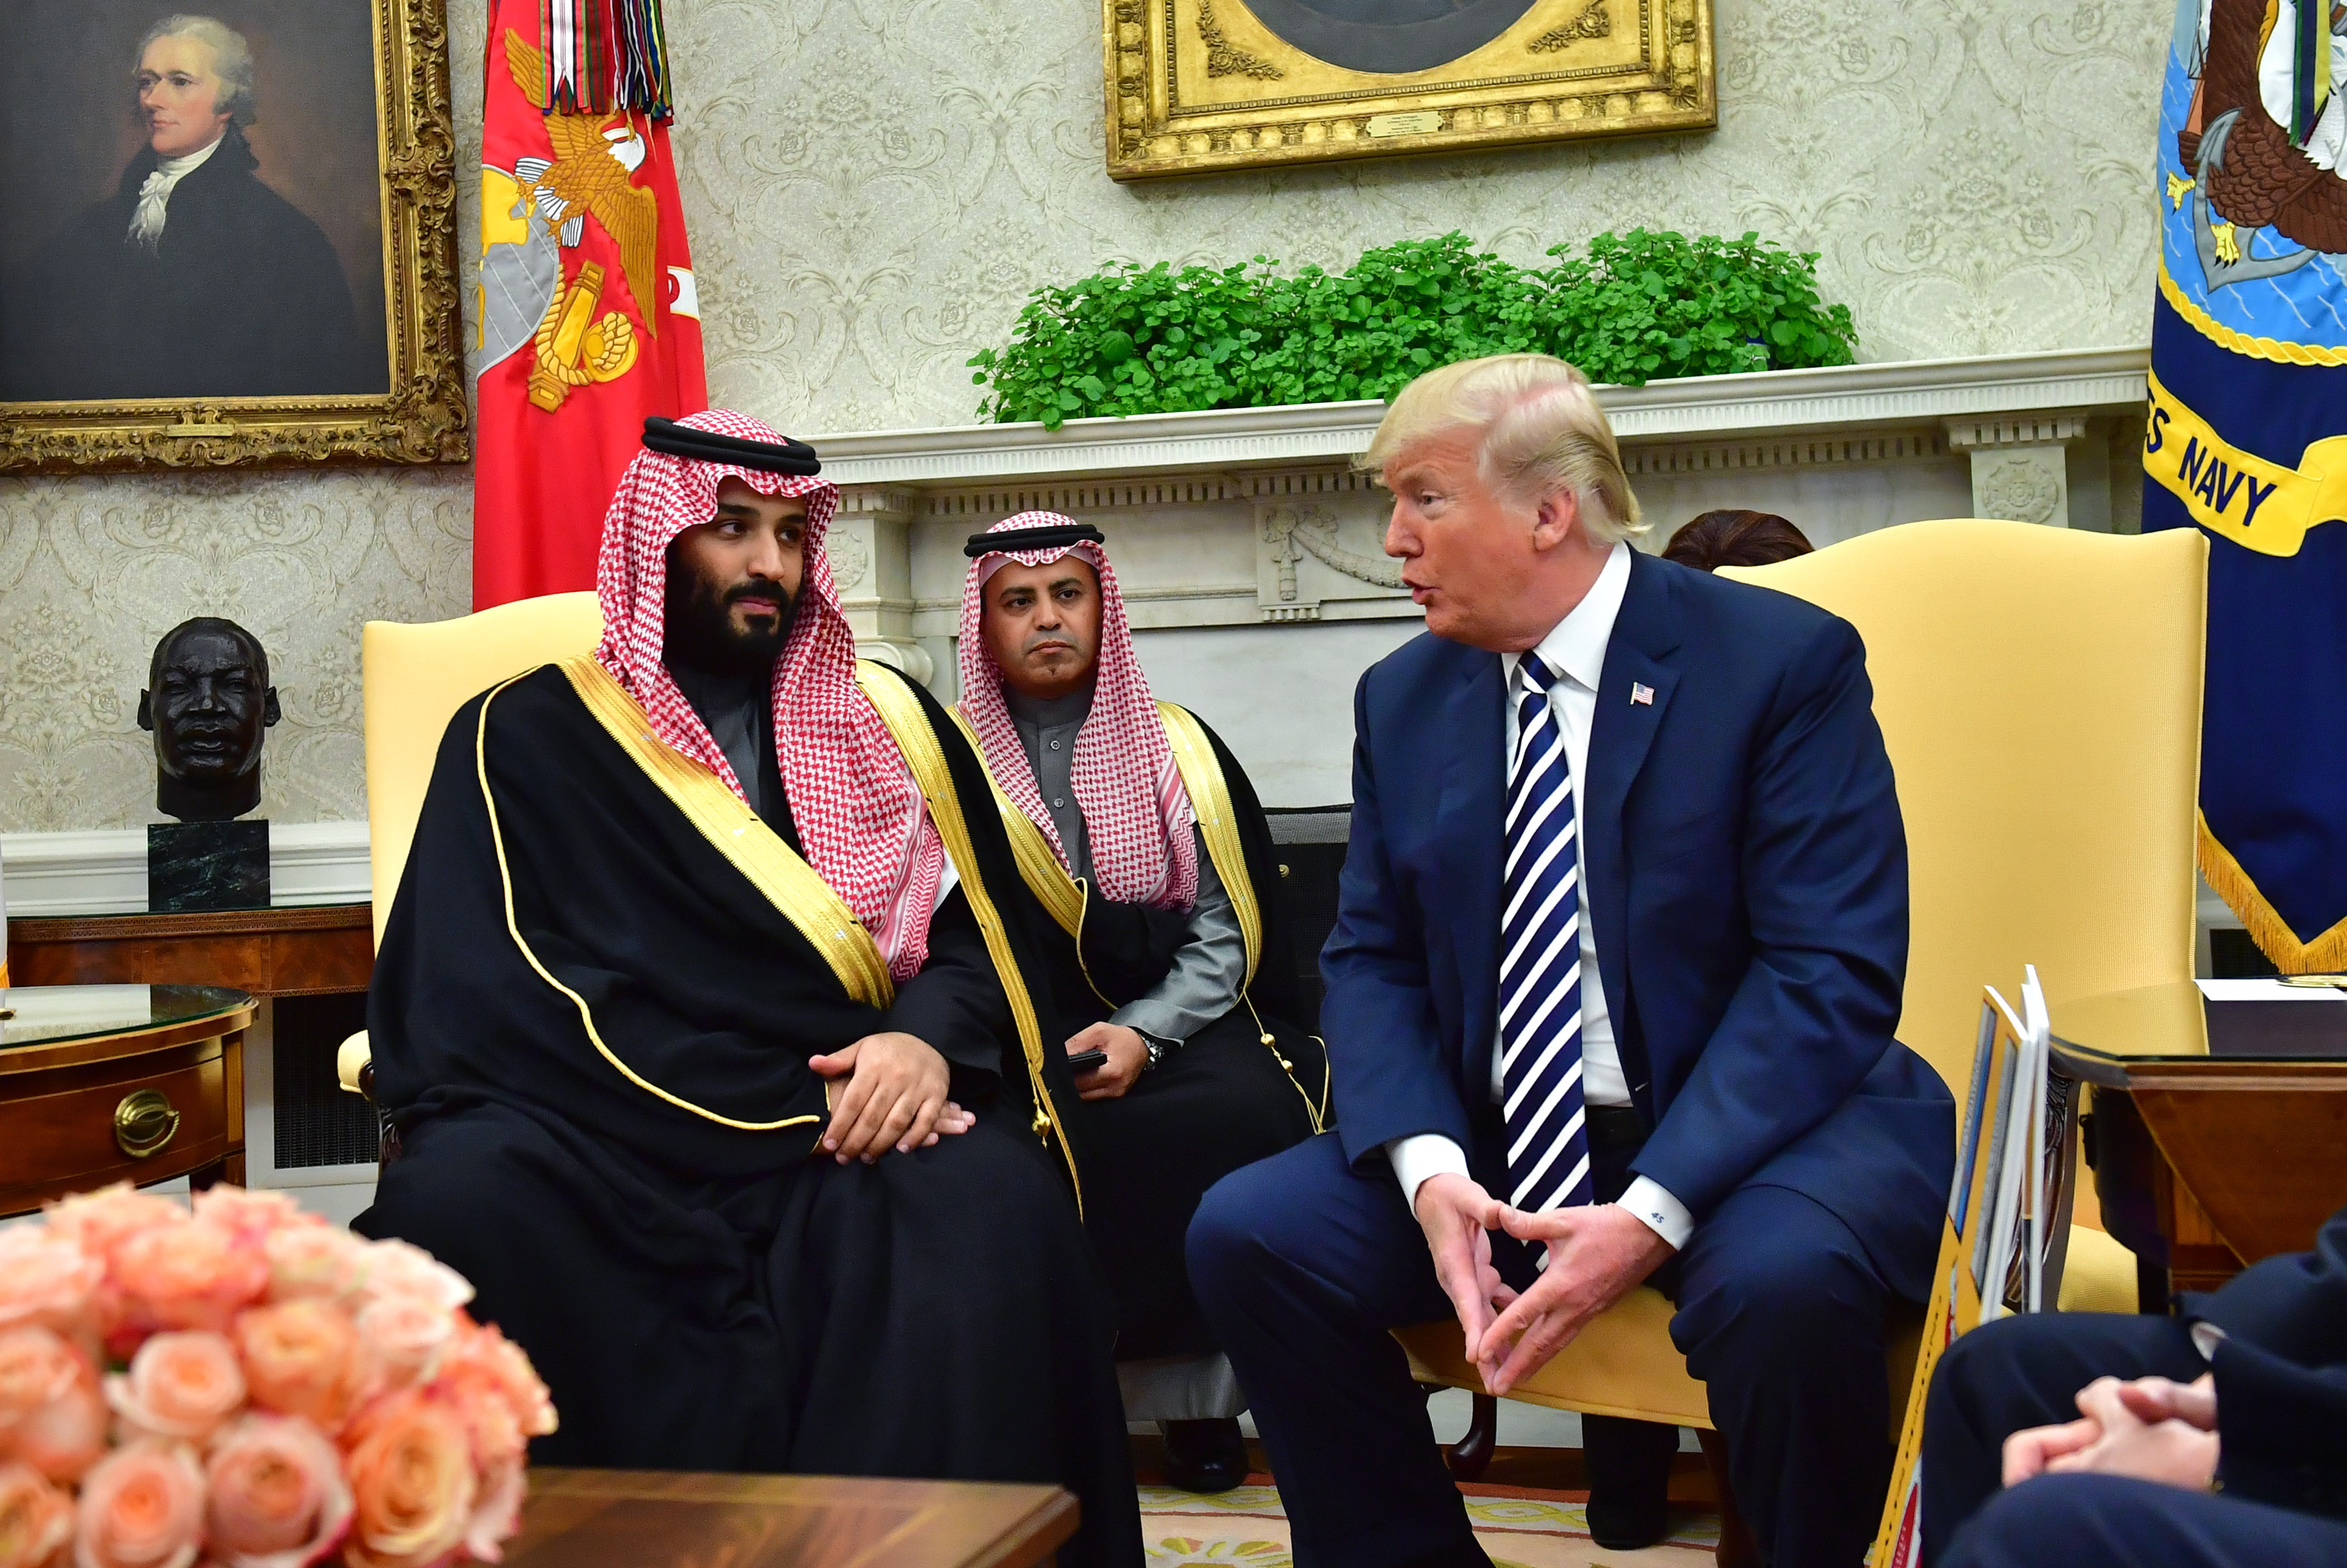 Fox News Research Responds to Trump Saudi Arabia Business Denials